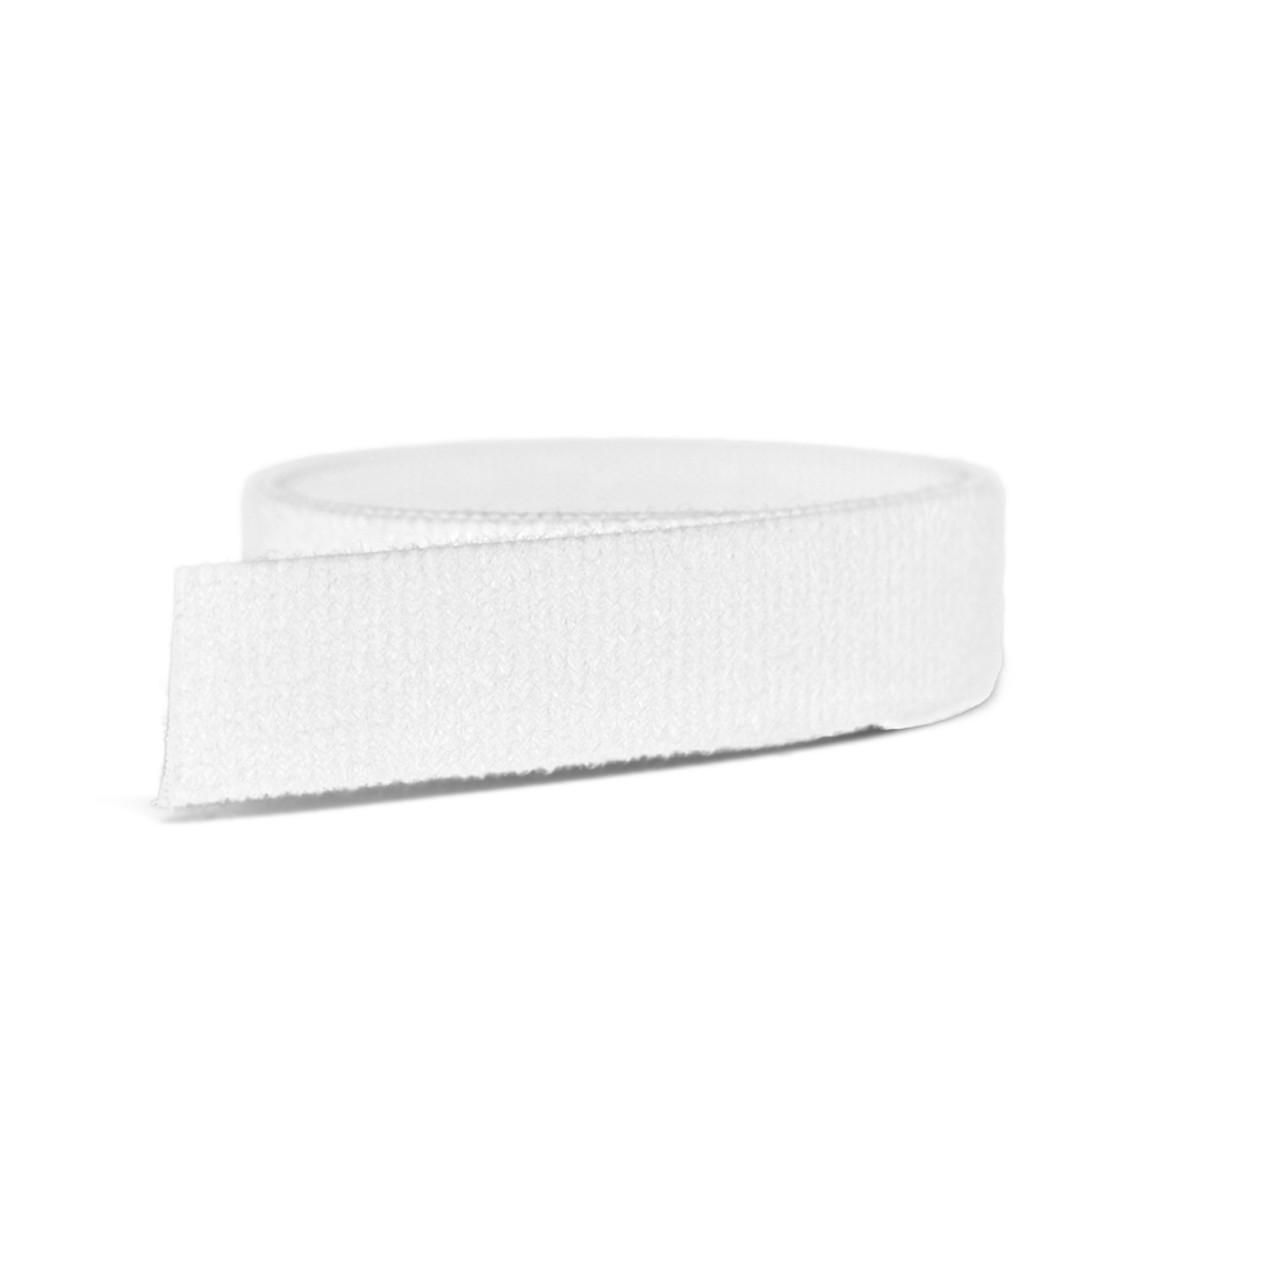 VELCRO® Brand ONE-WRAP® Tape White Mini Rolls / Velcro Straps - Bundling Straps - Velcro Tie - Velcro Strap